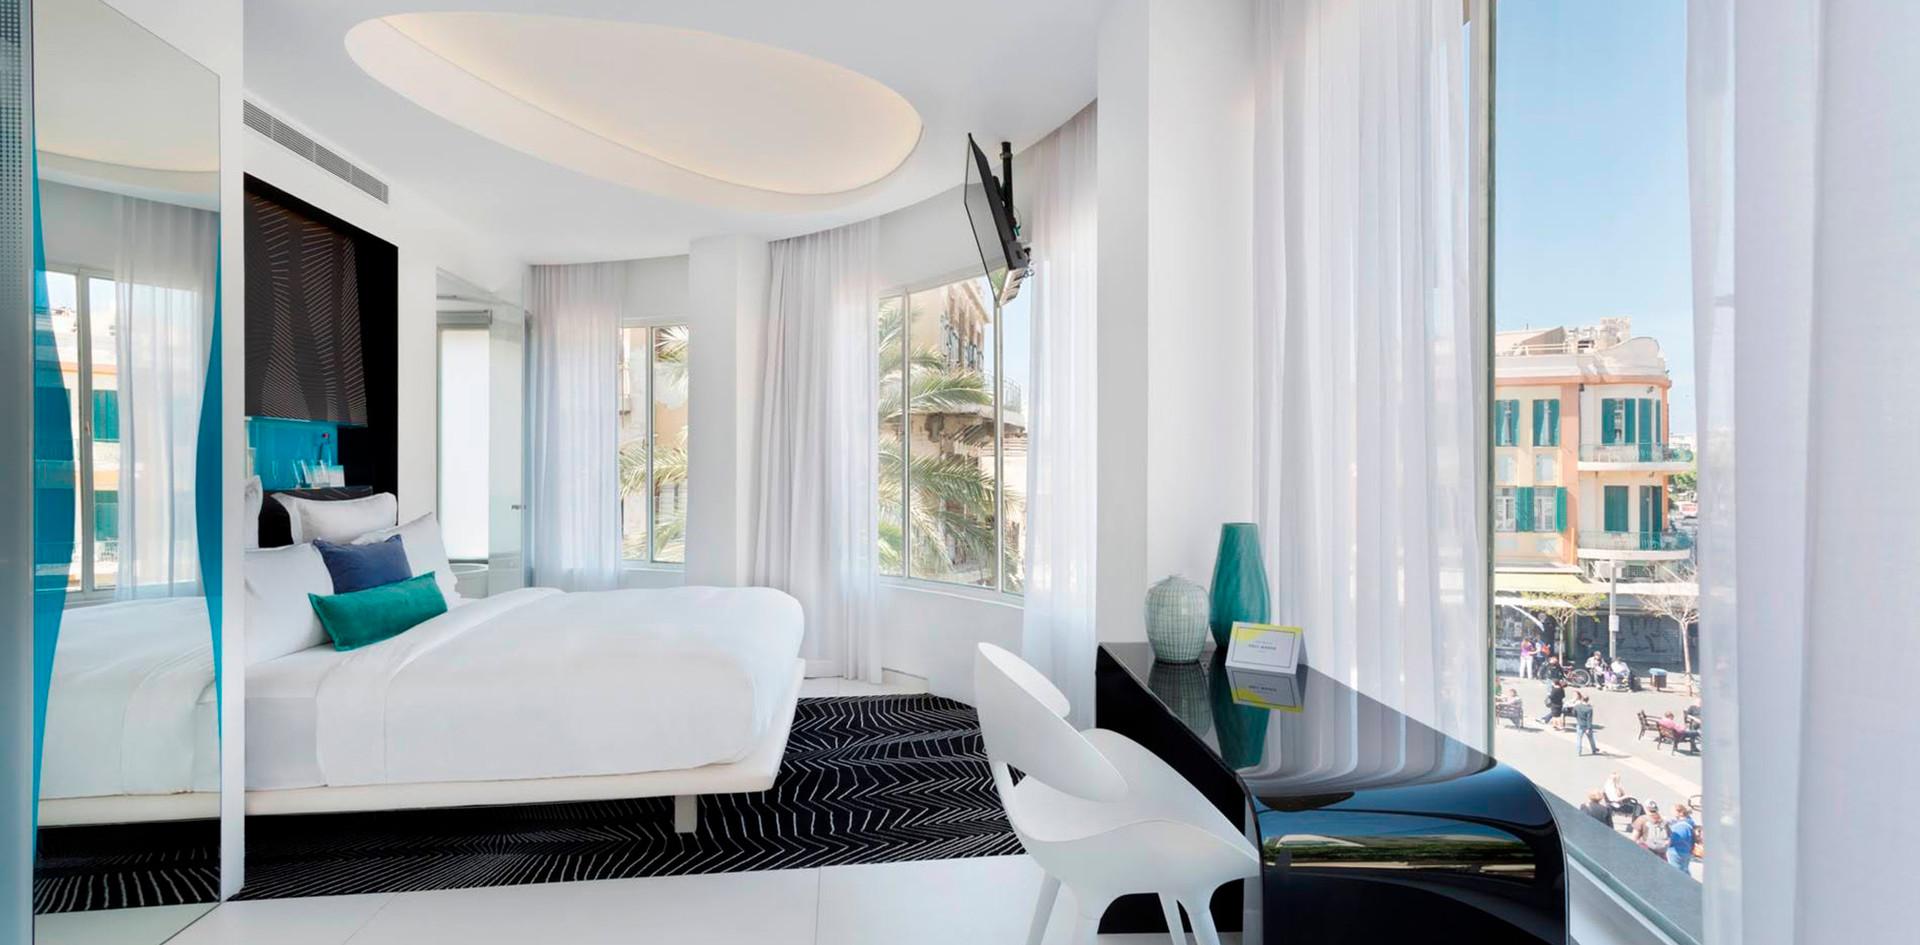 poli_house_boutique_hotel_tel_aviv_21_1.